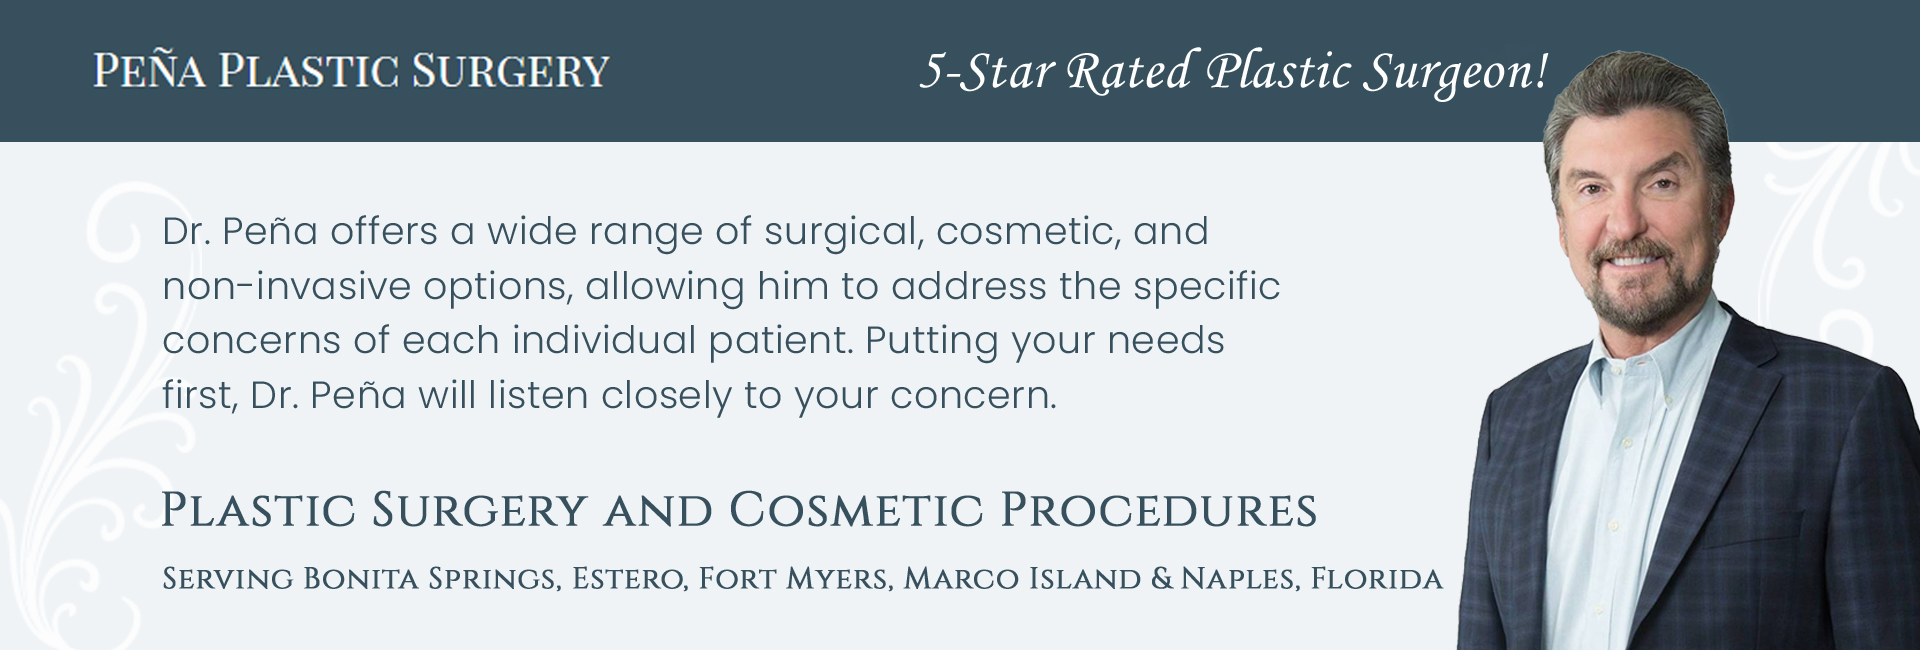 Pena Plastic Surgery - Manuel Pena, MD reviews   Cosmetic Surgeons at 6370 Pine Ridge Rd - Naples FL